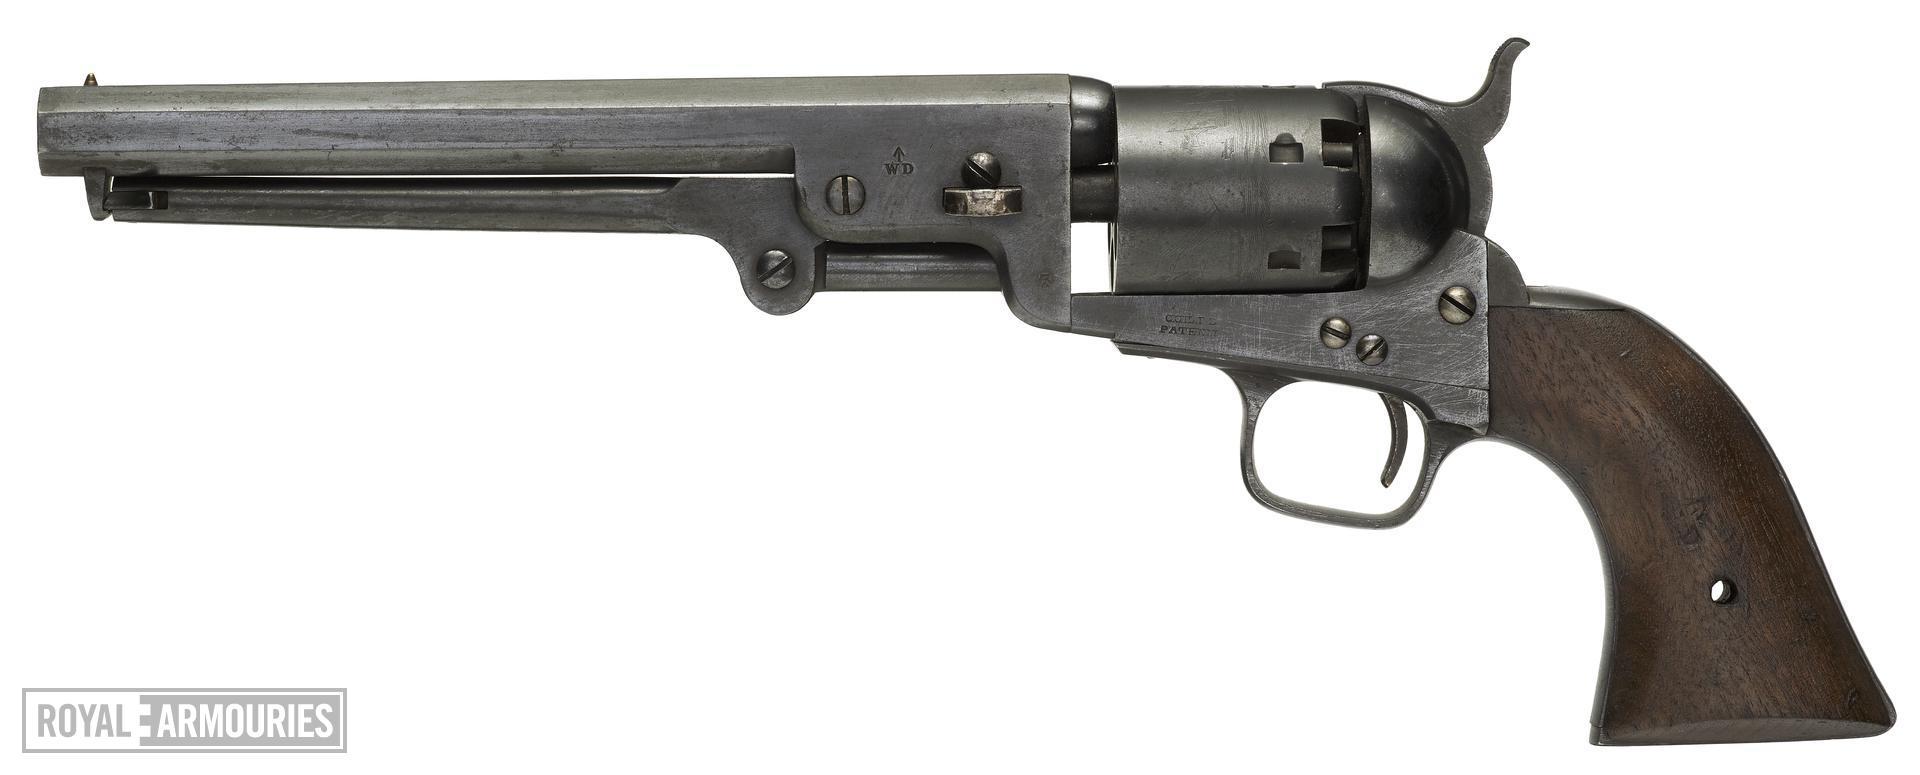 Percussion six-shot military revolver - Colt Navy Model 1851